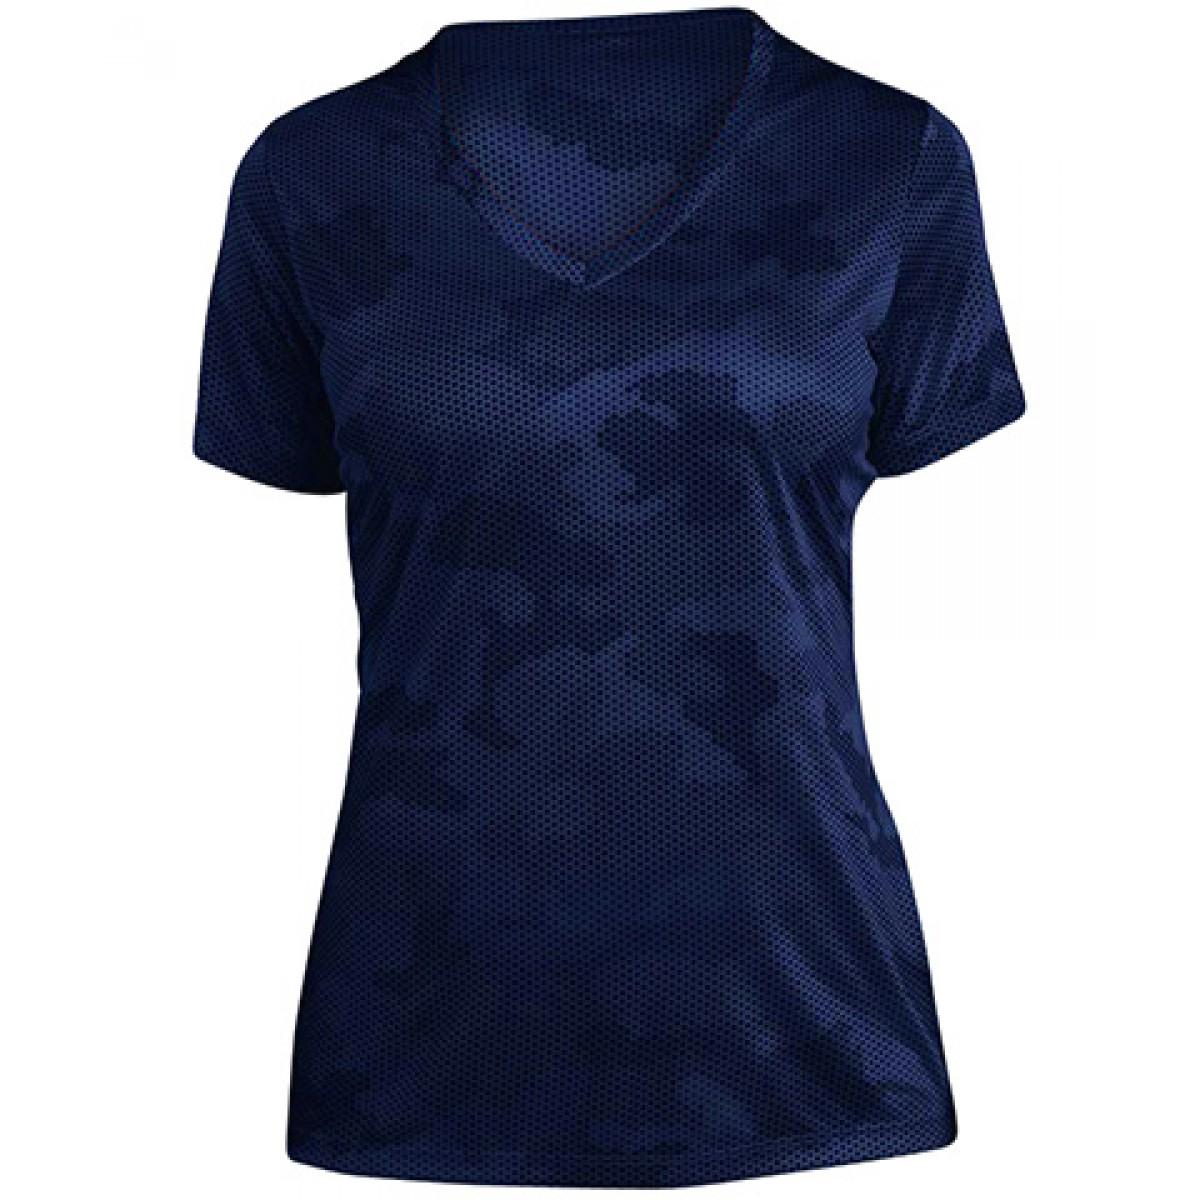 Ladies CamoHex V-Neck Tee-Royal Blue-XL